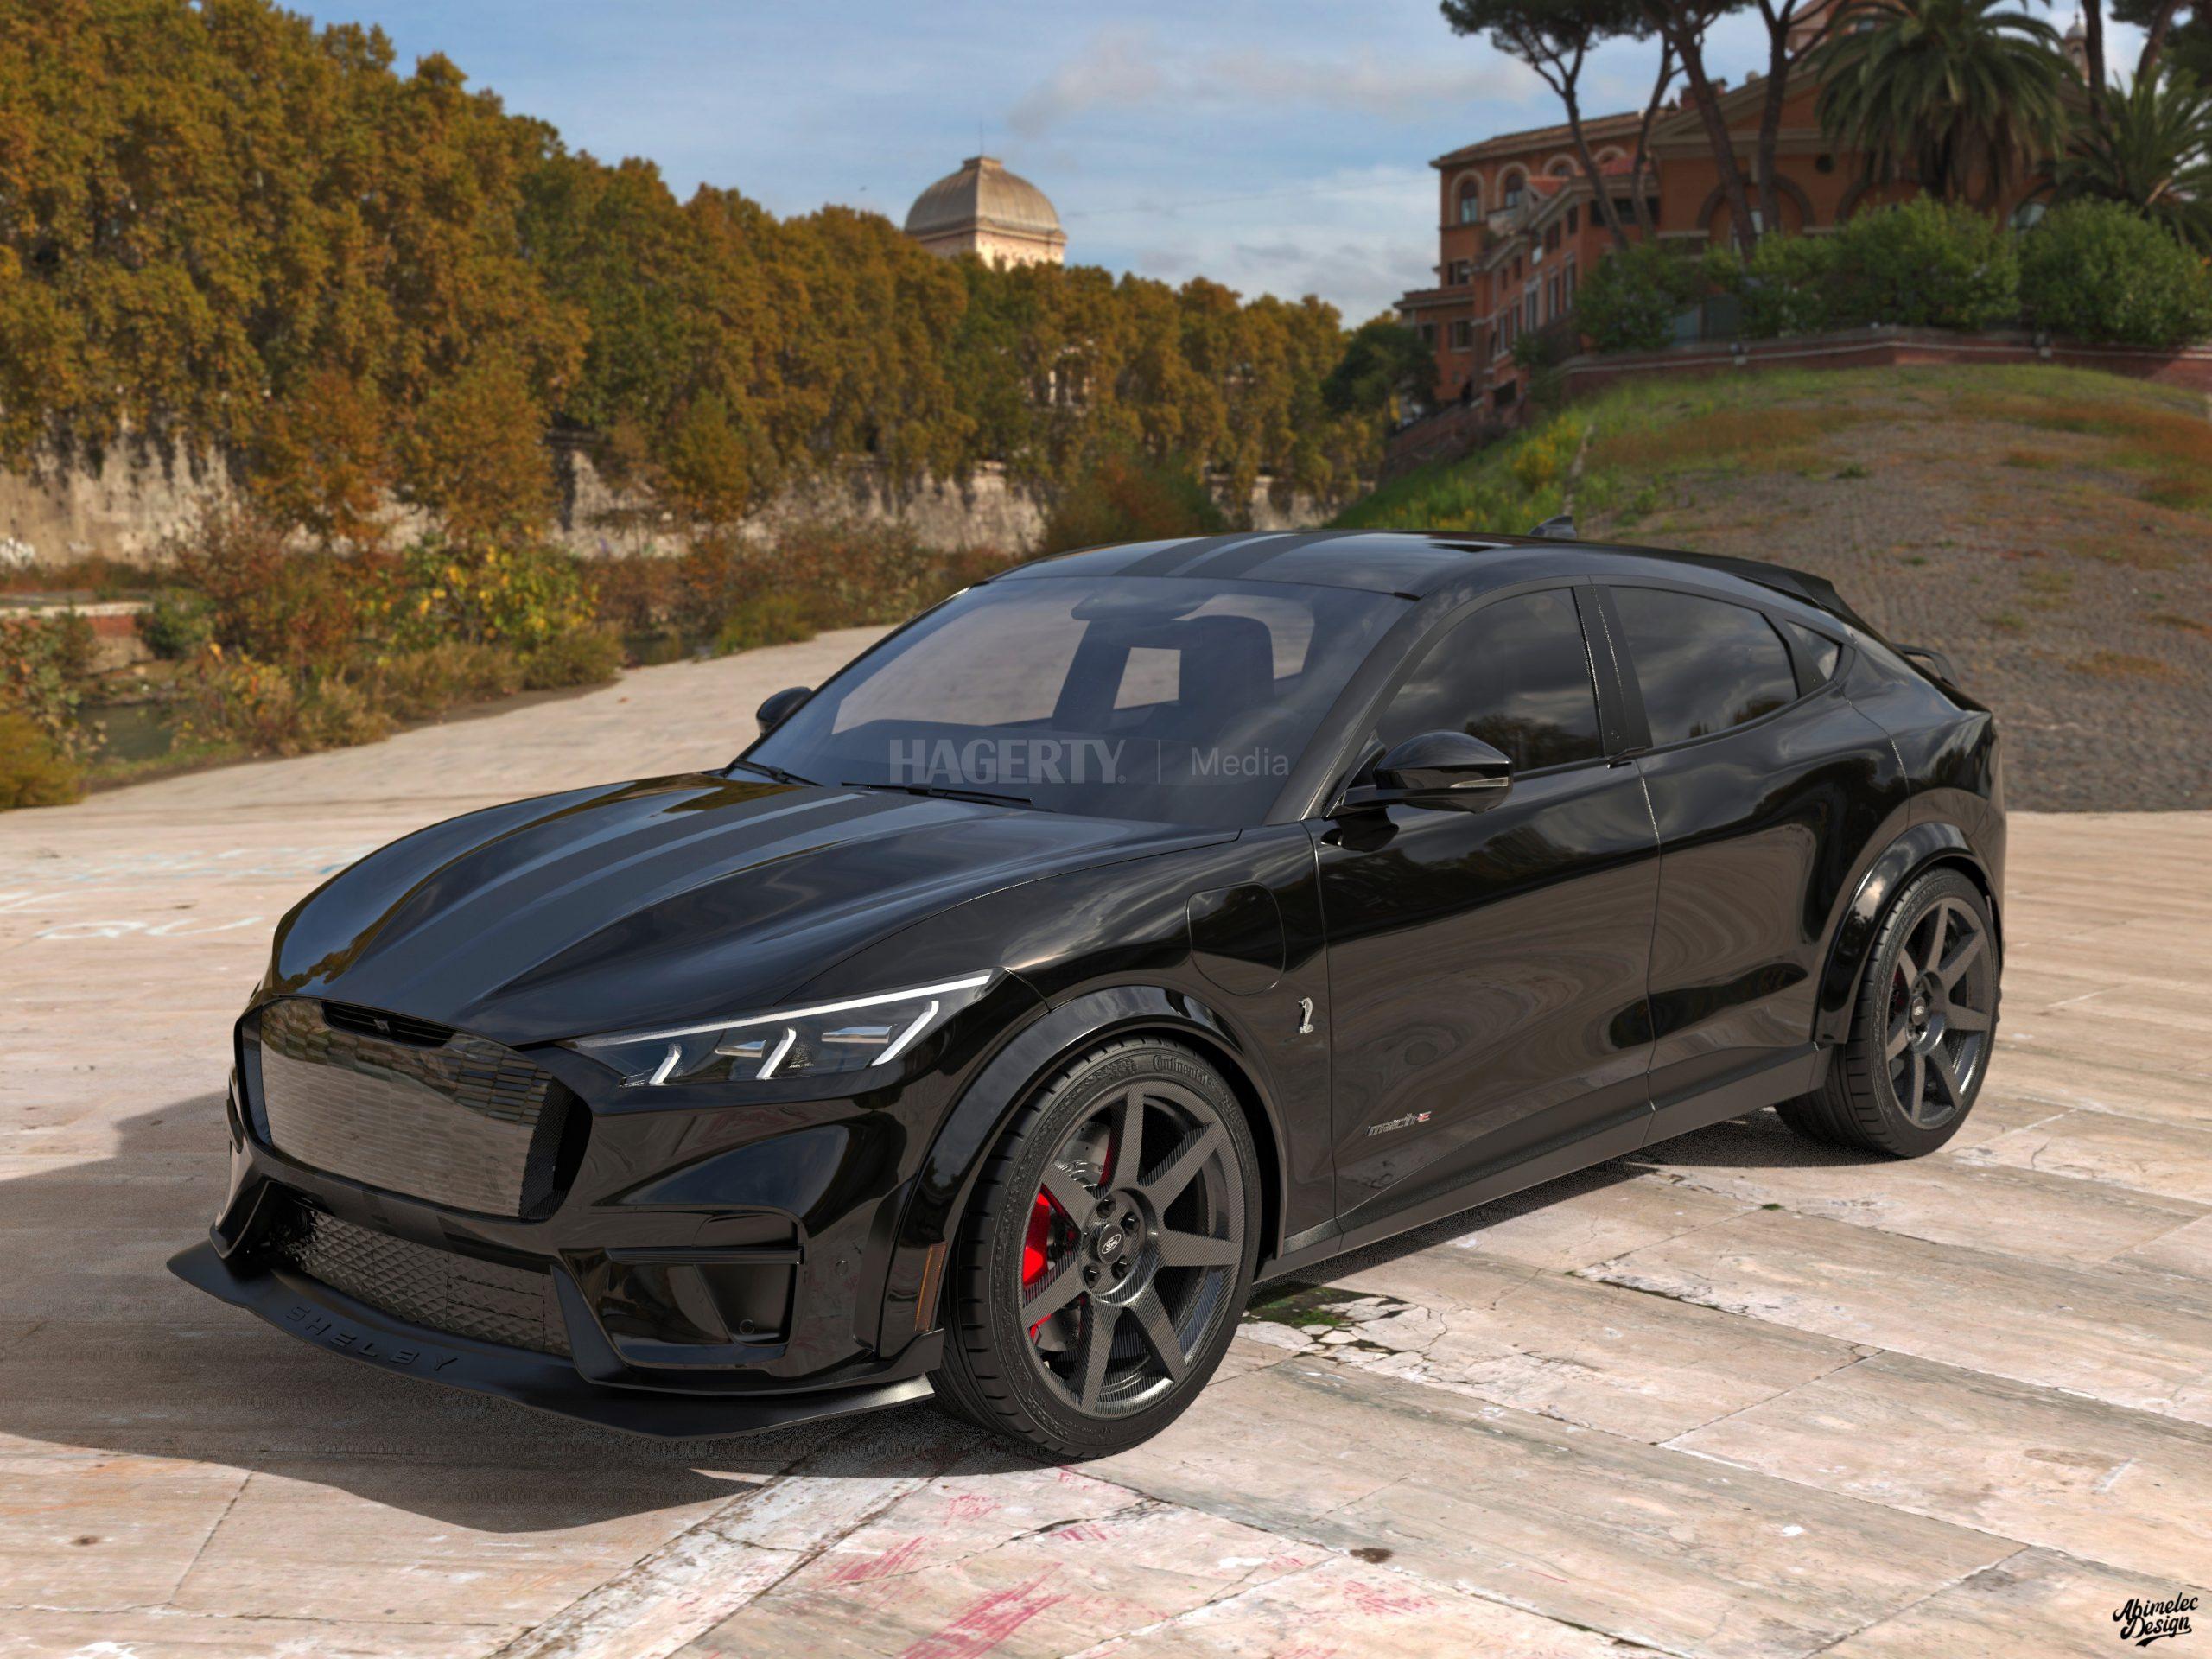 Shelby GTE black